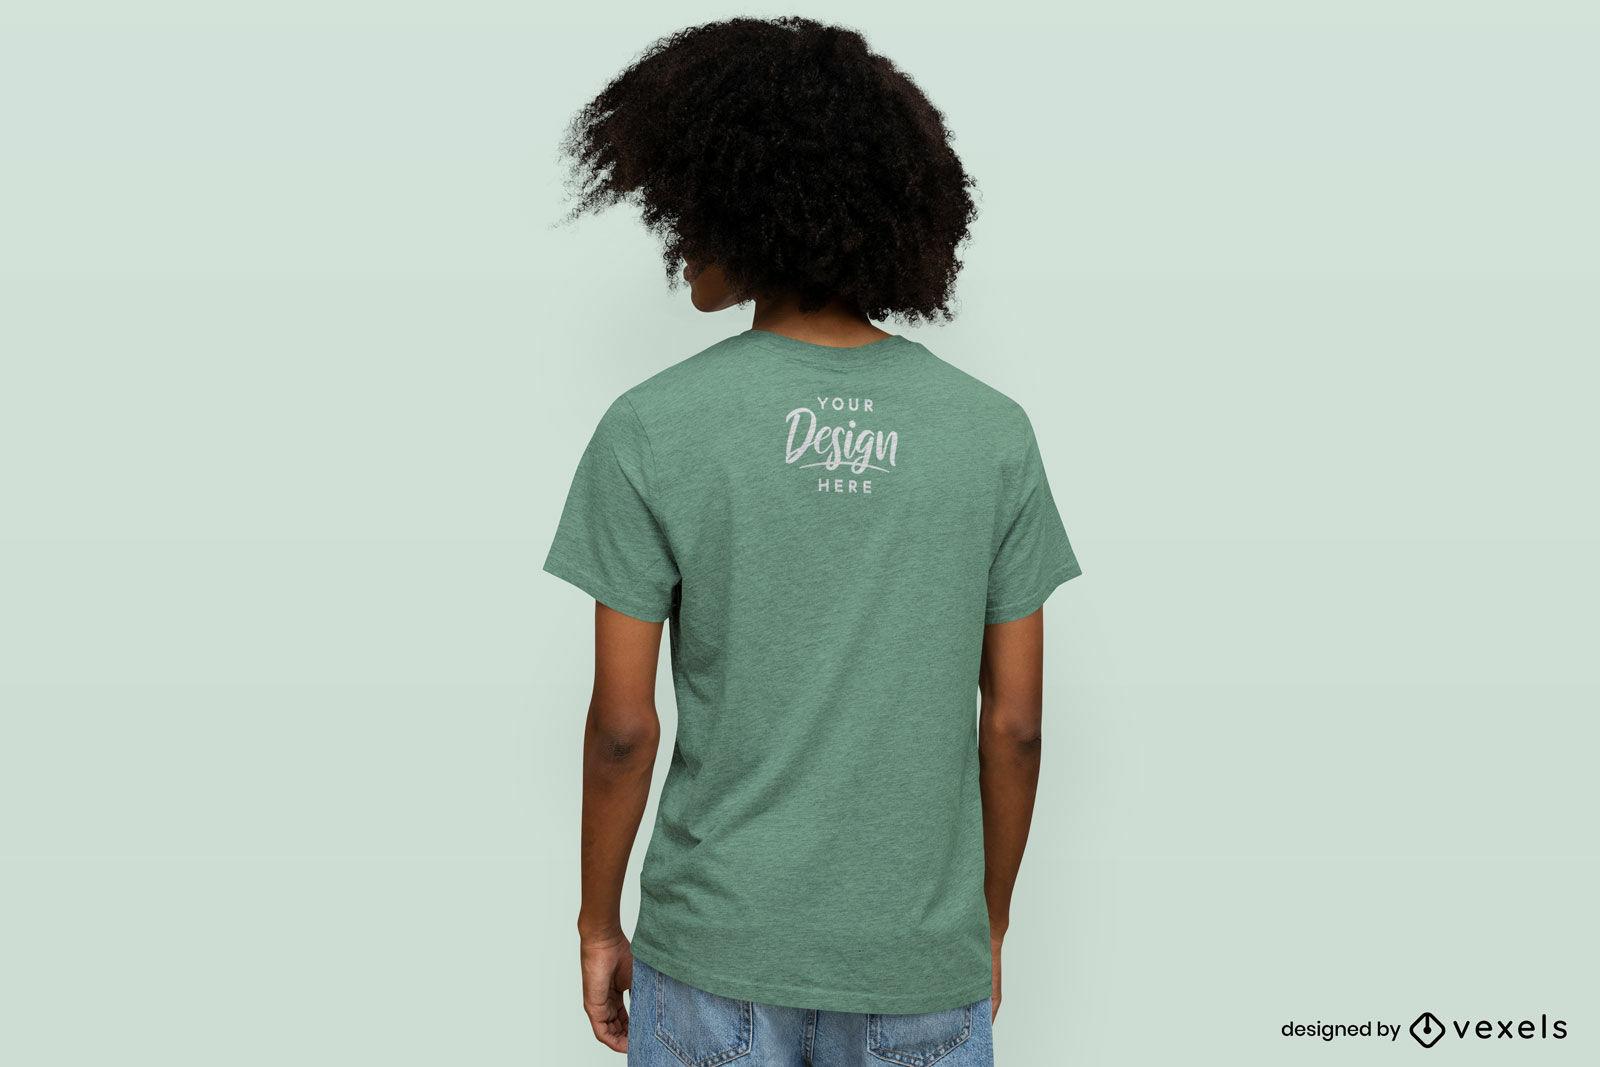 Mann rückwärts im einfarbigen T-Shirt-Mockup